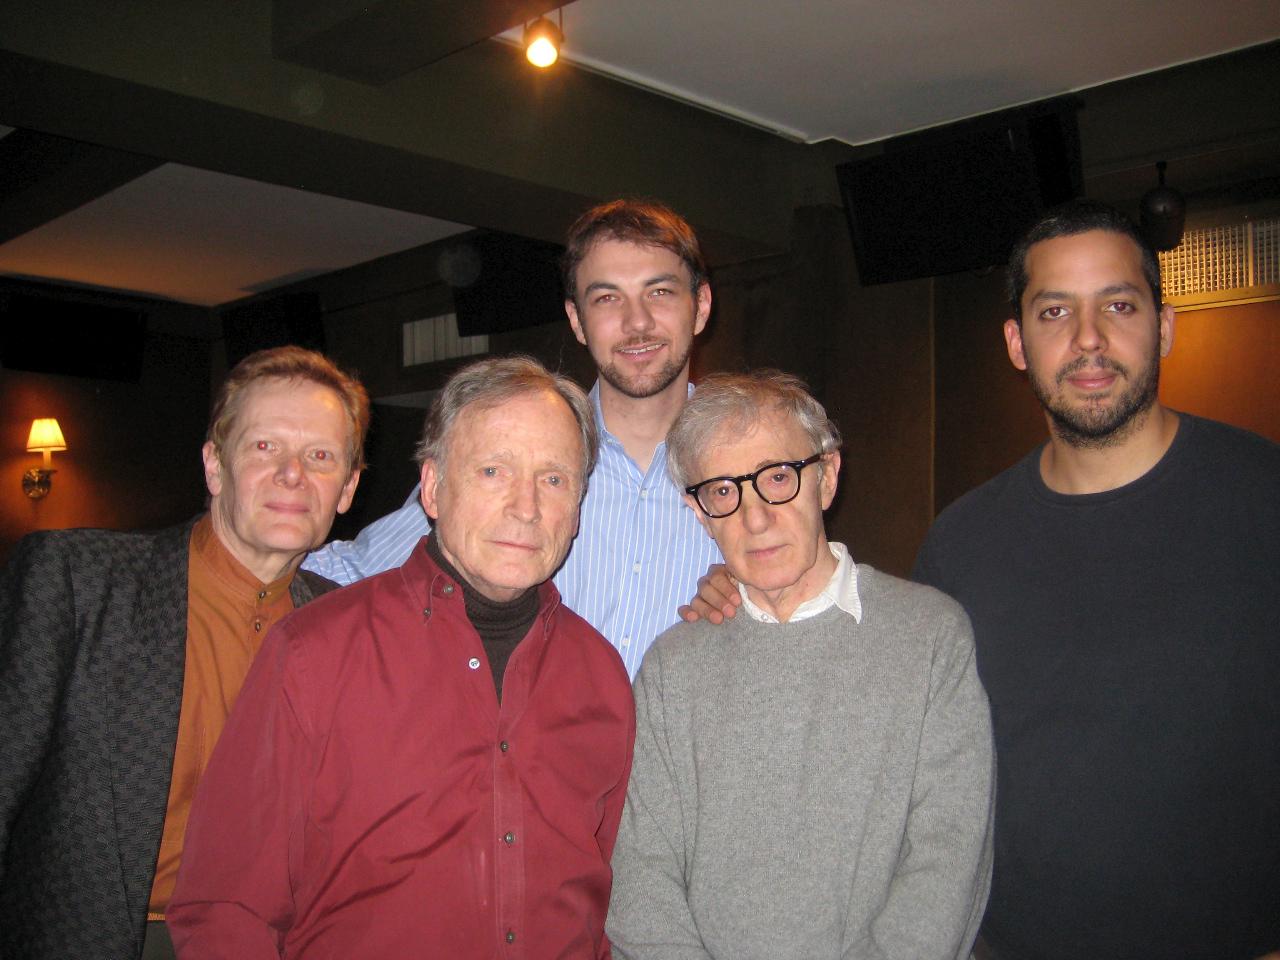 Philippe Petit, Dick Cavett, Woody Allen, and David Blaine